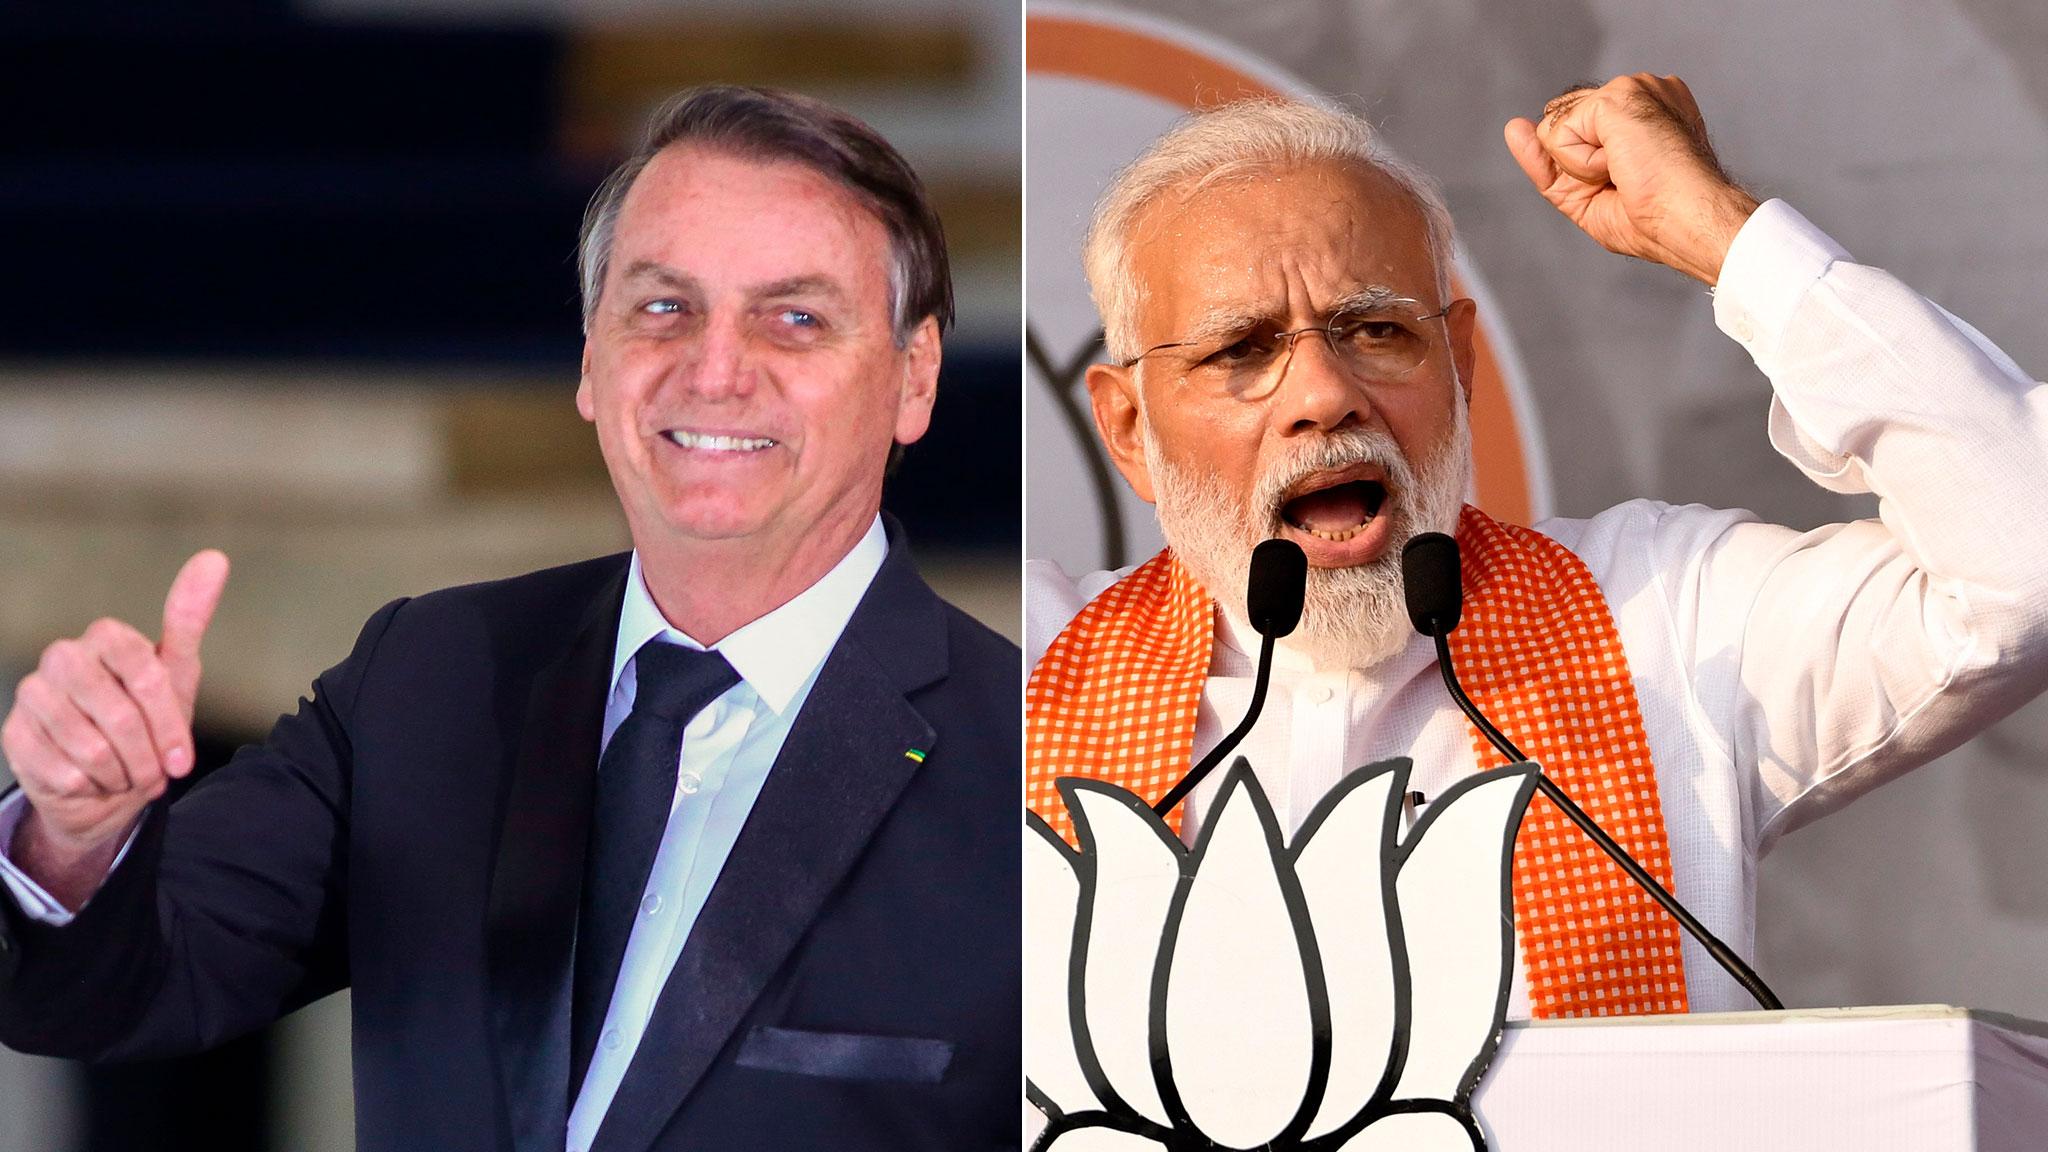 Jair Bolsonaro finds unlikely ally in Hindu nationalist Modi